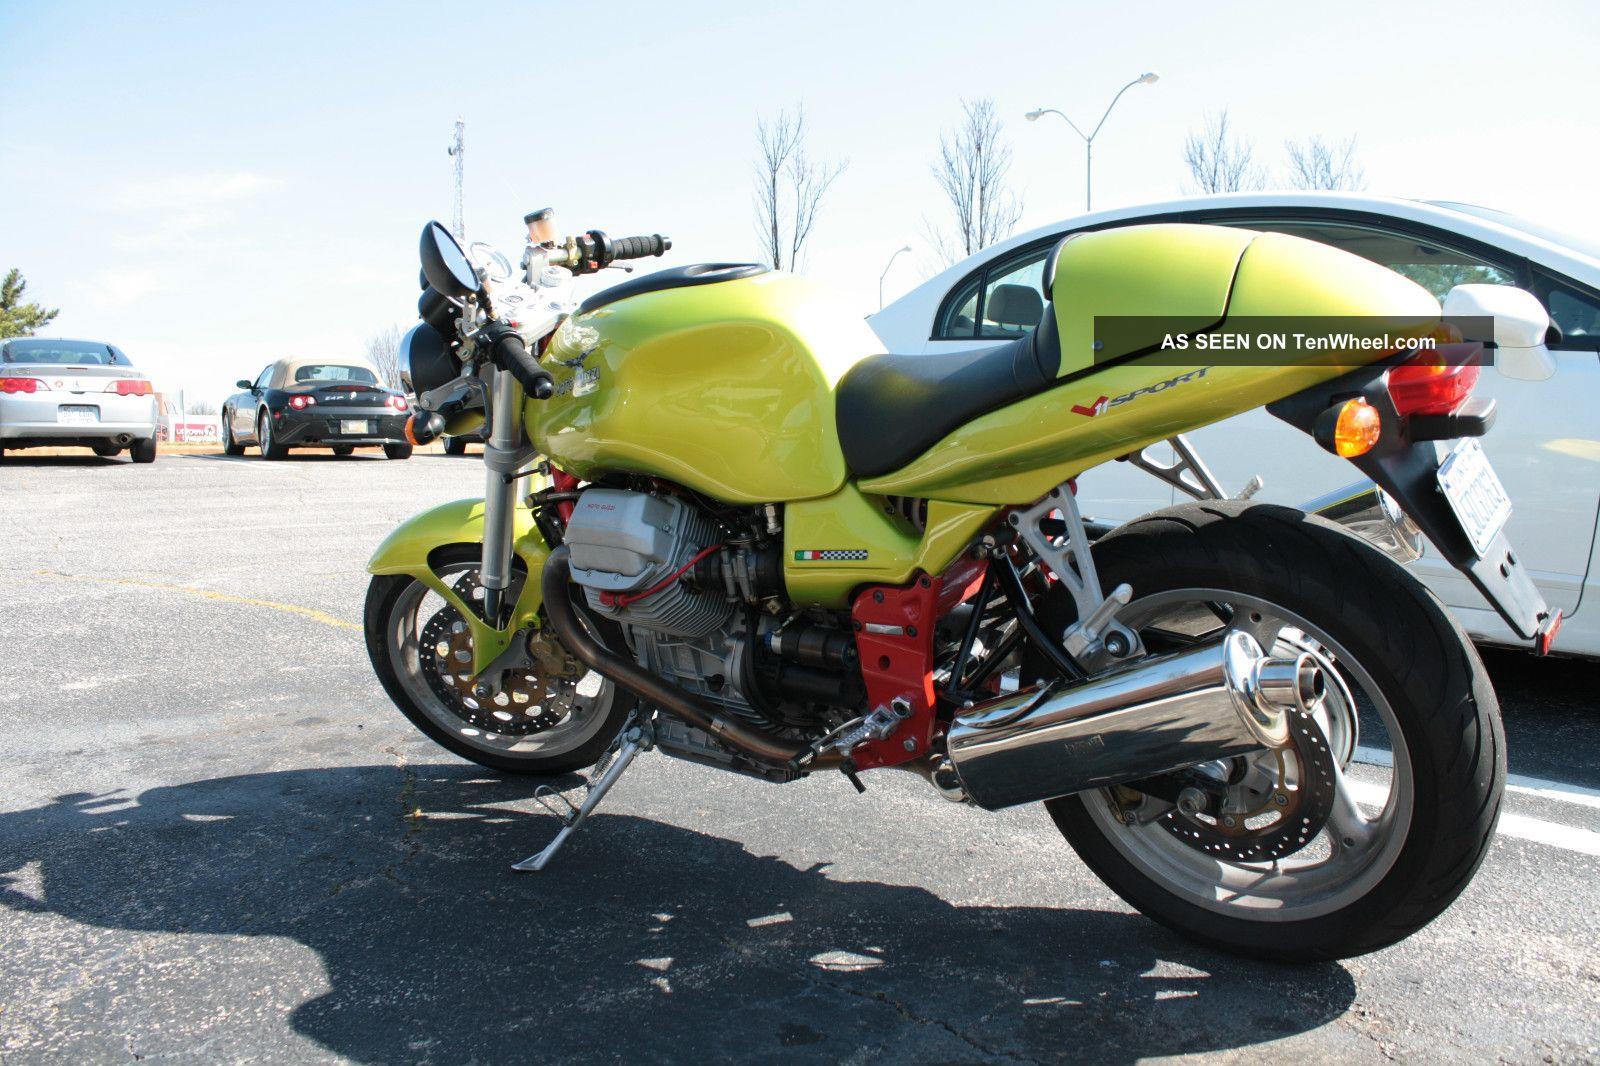 2000 moto guzzi v11 sport. Black Bedroom Furniture Sets. Home Design Ideas